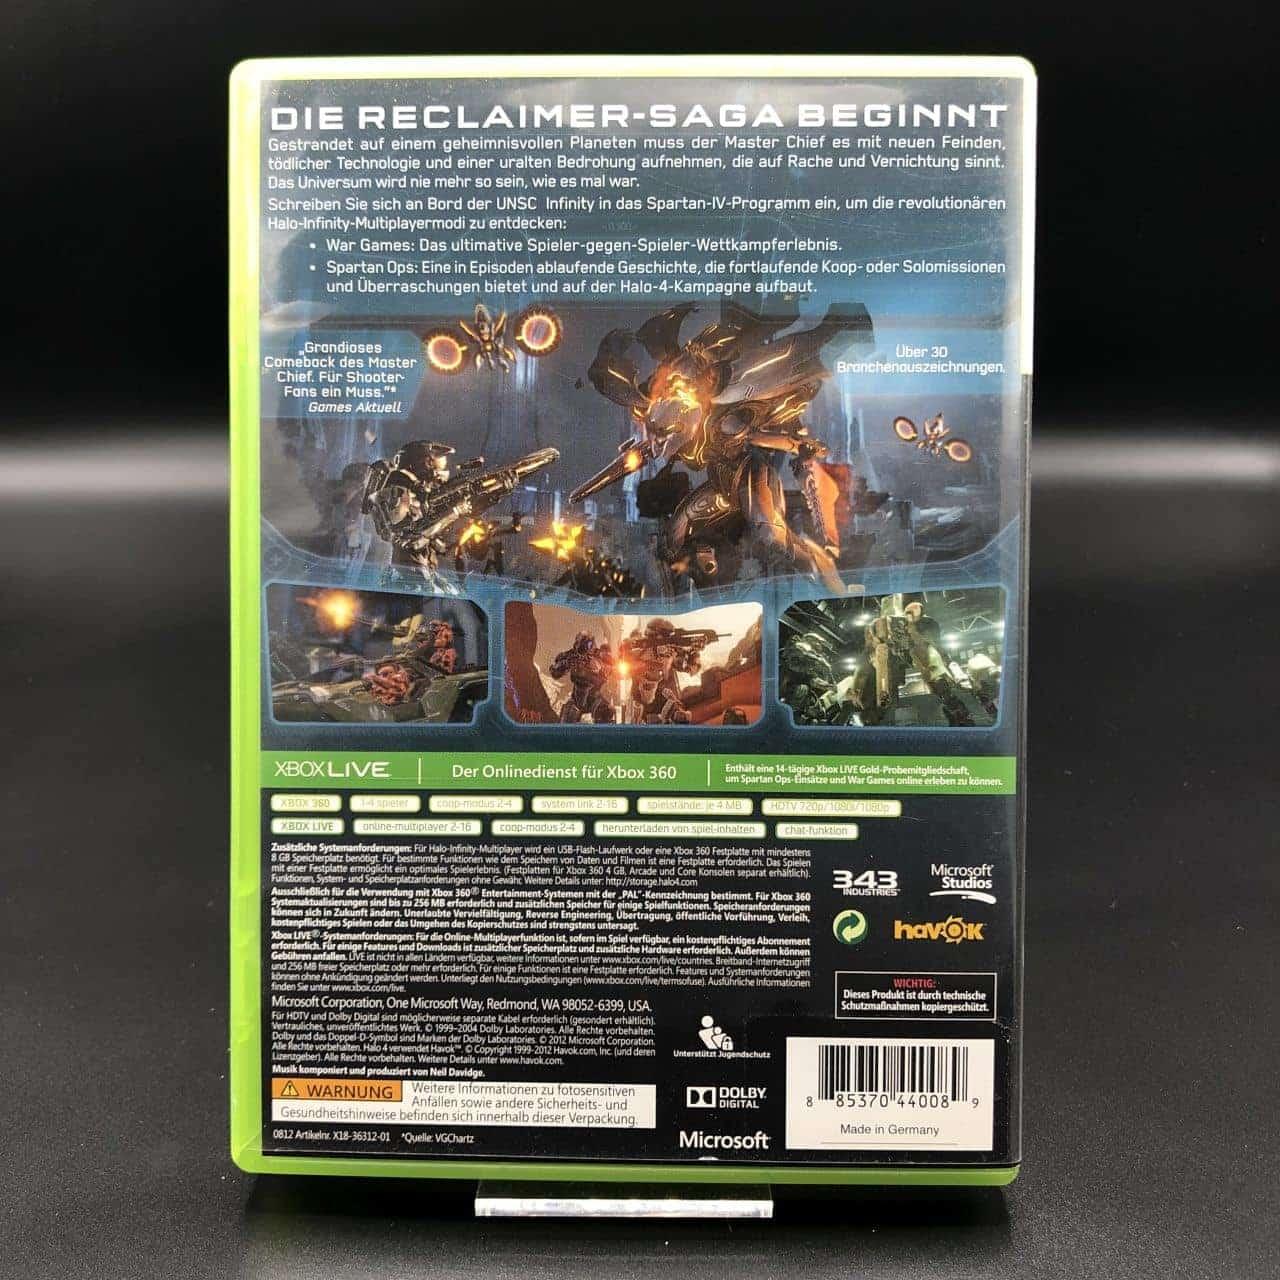 Halo 4 (ohne Anleitung) (Sehr gut) XBOX 360